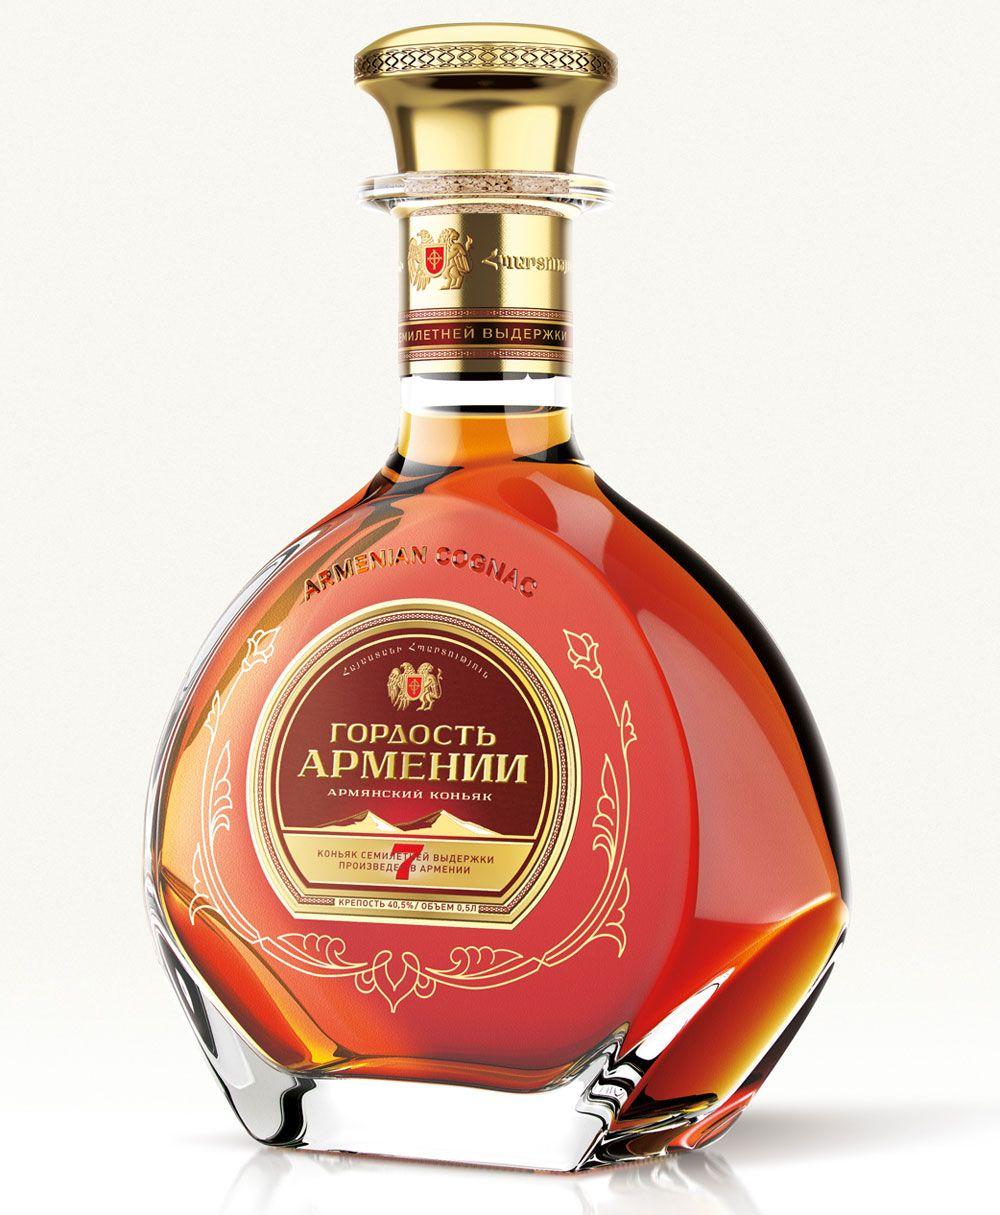 Cognac Pride Of Armenia Alkogolnyj Napitok Butylki Likera Alkogol Butylki